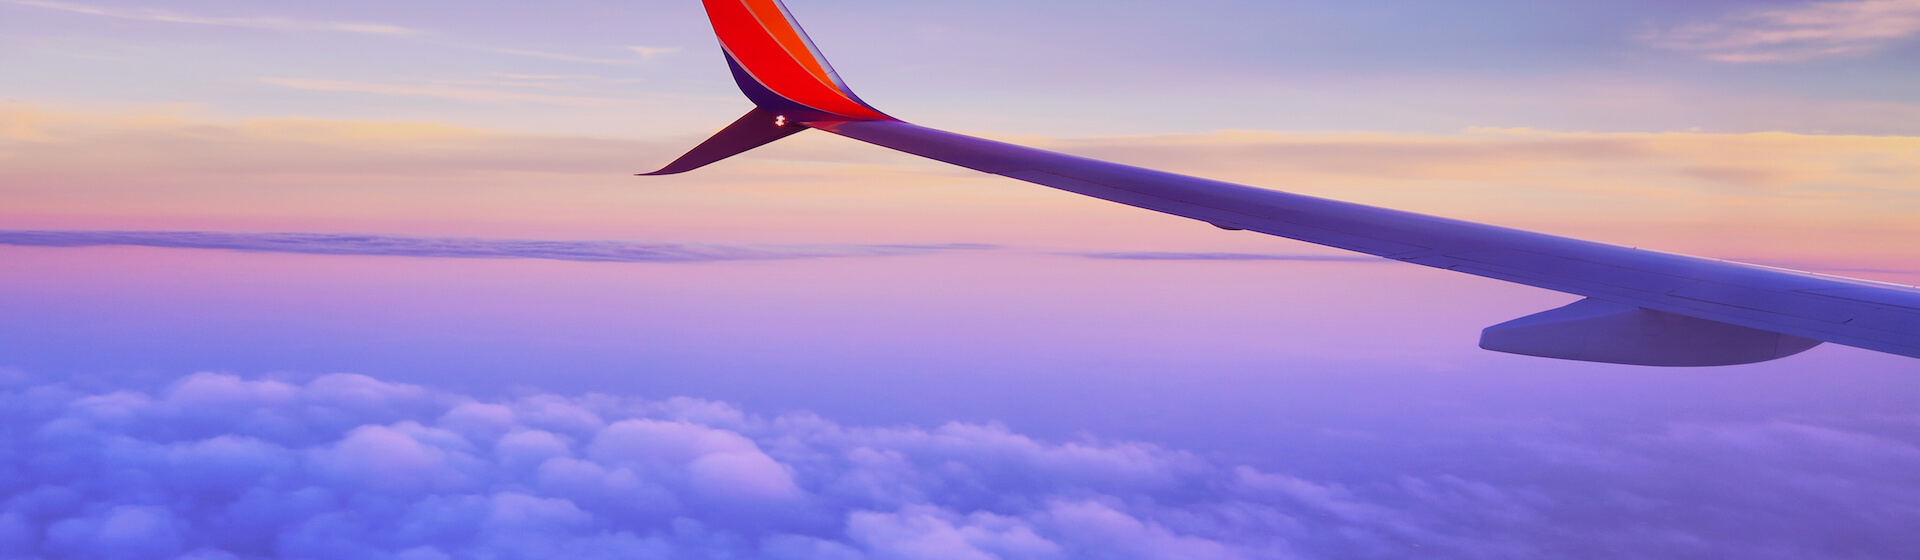 Plane wing in sky